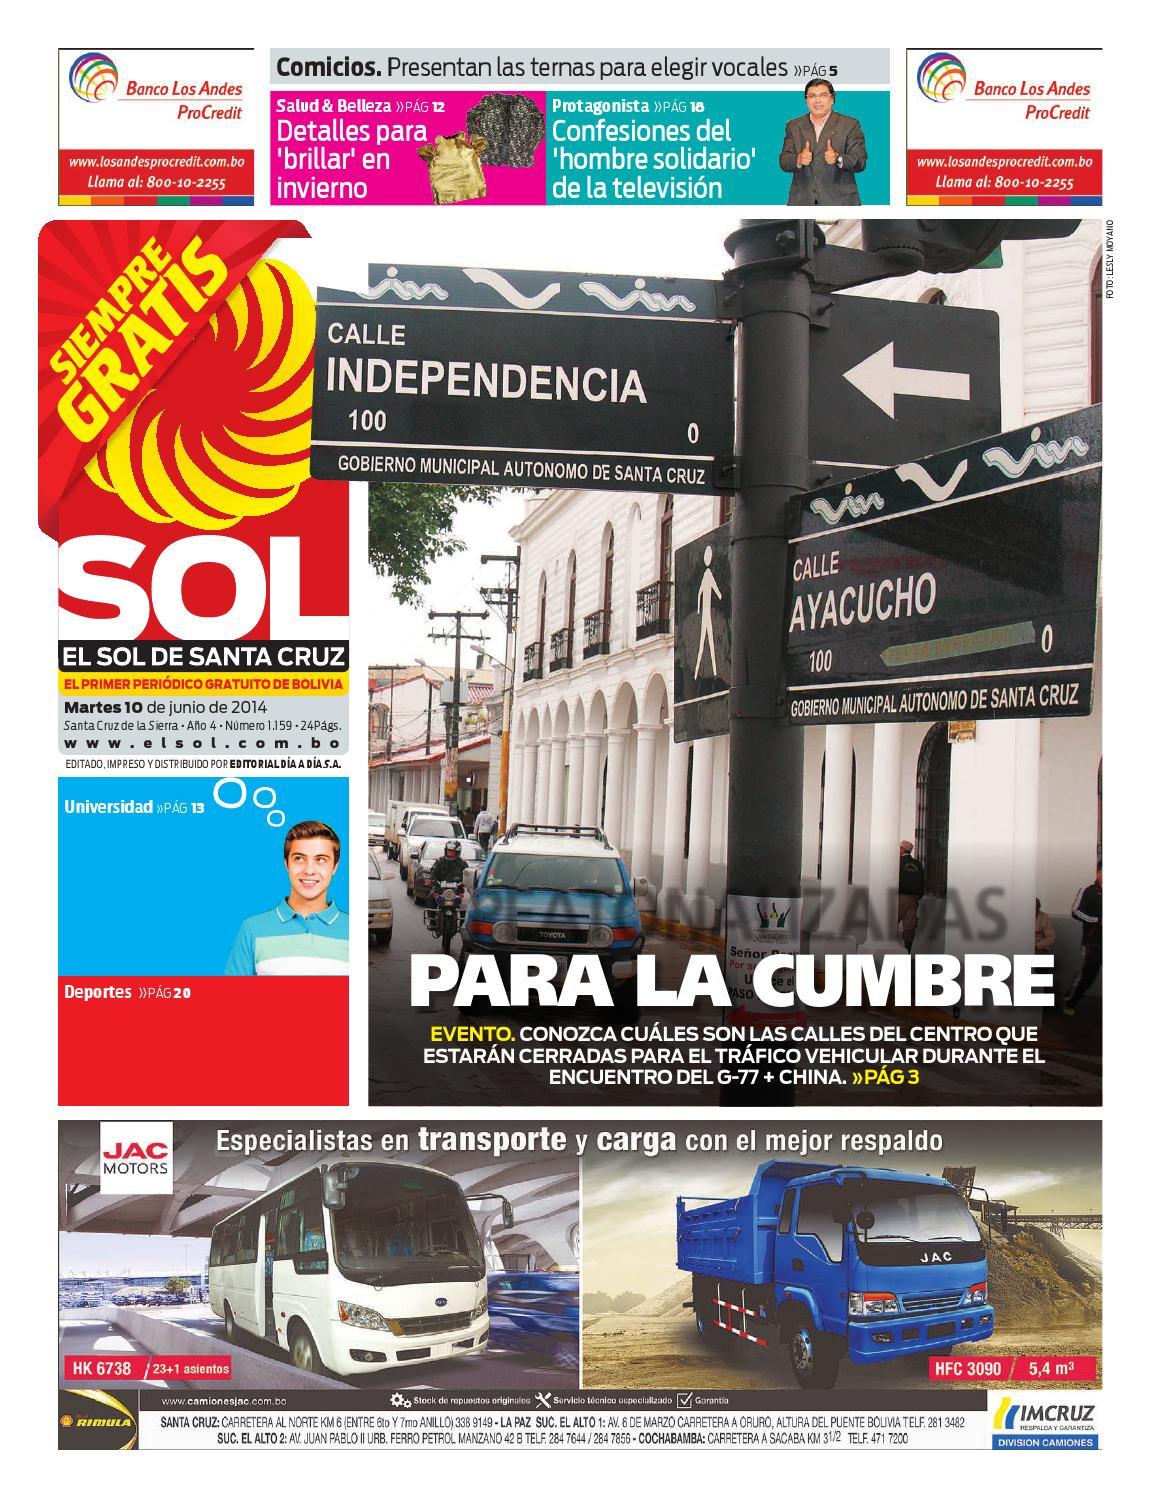 El Sol 10-06-2014 by El Dia - issuu